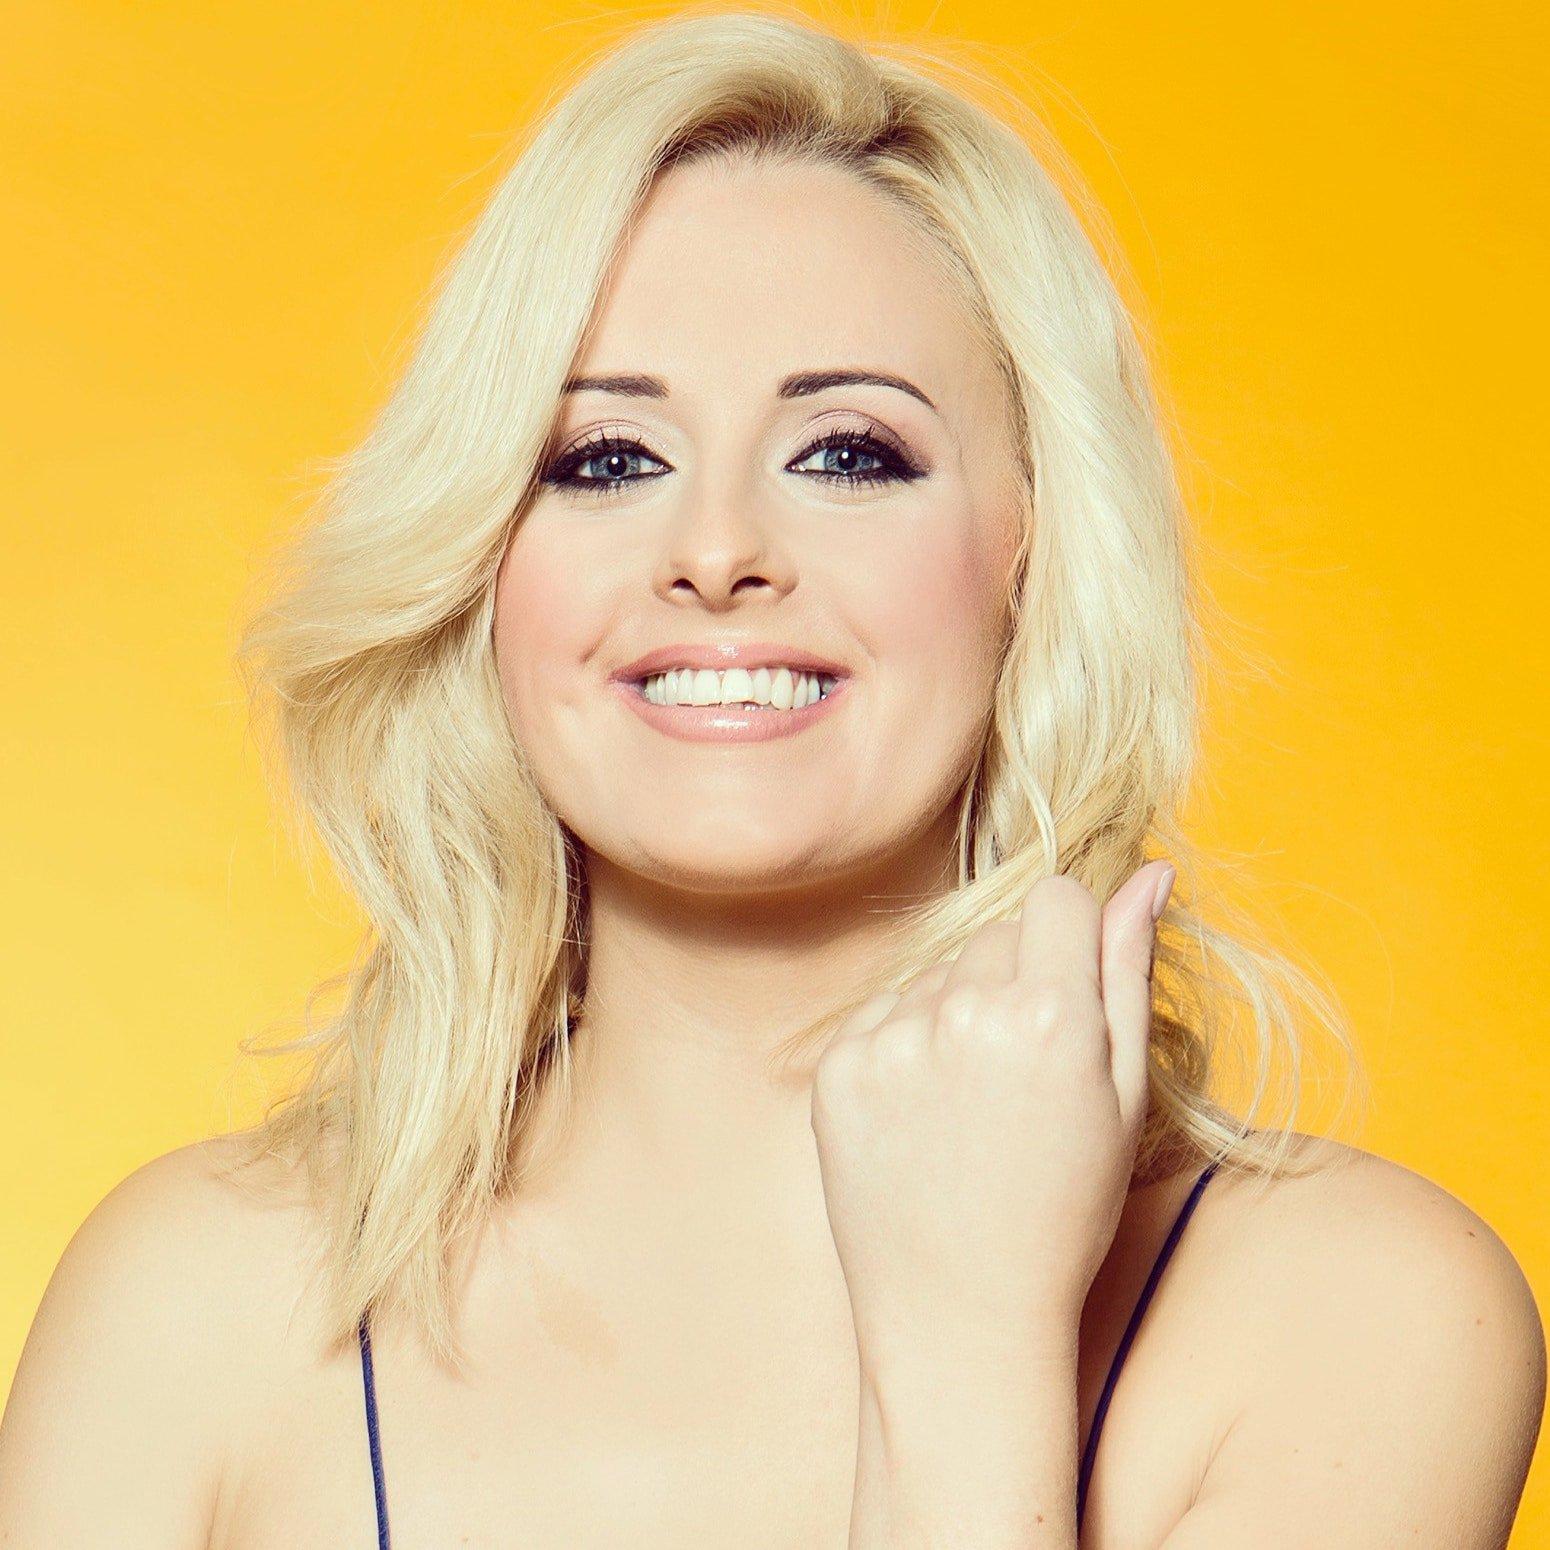 Katie-Thistleton-TV-Raio-CBBS-kids-presenter-host-at-Great-British-Speakers